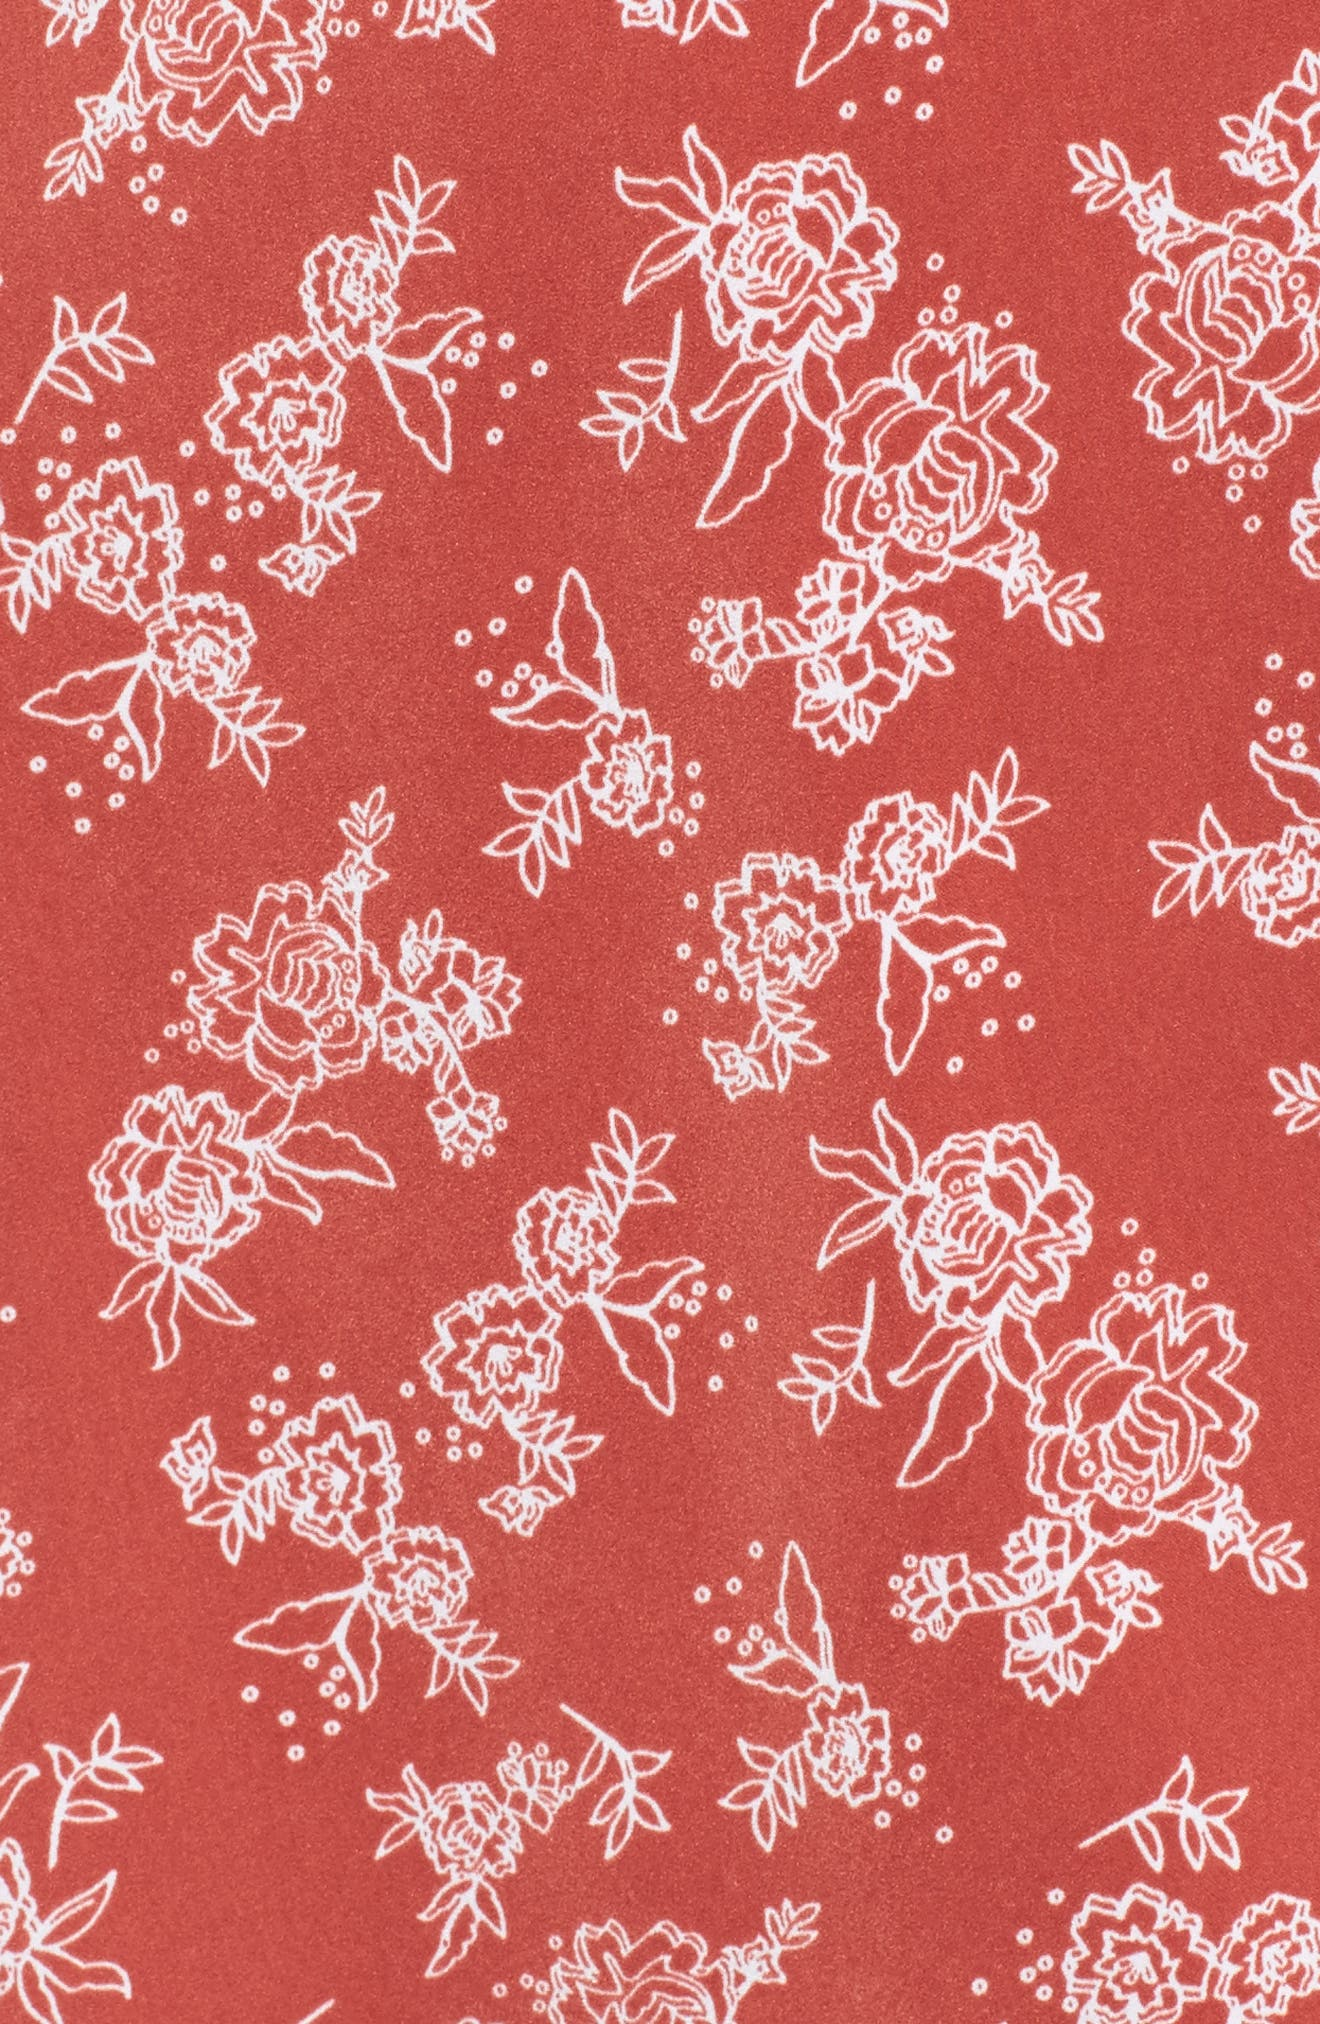 Ophelia Floral Print Wrap Dress,                             Alternate thumbnail 5, color,                             600